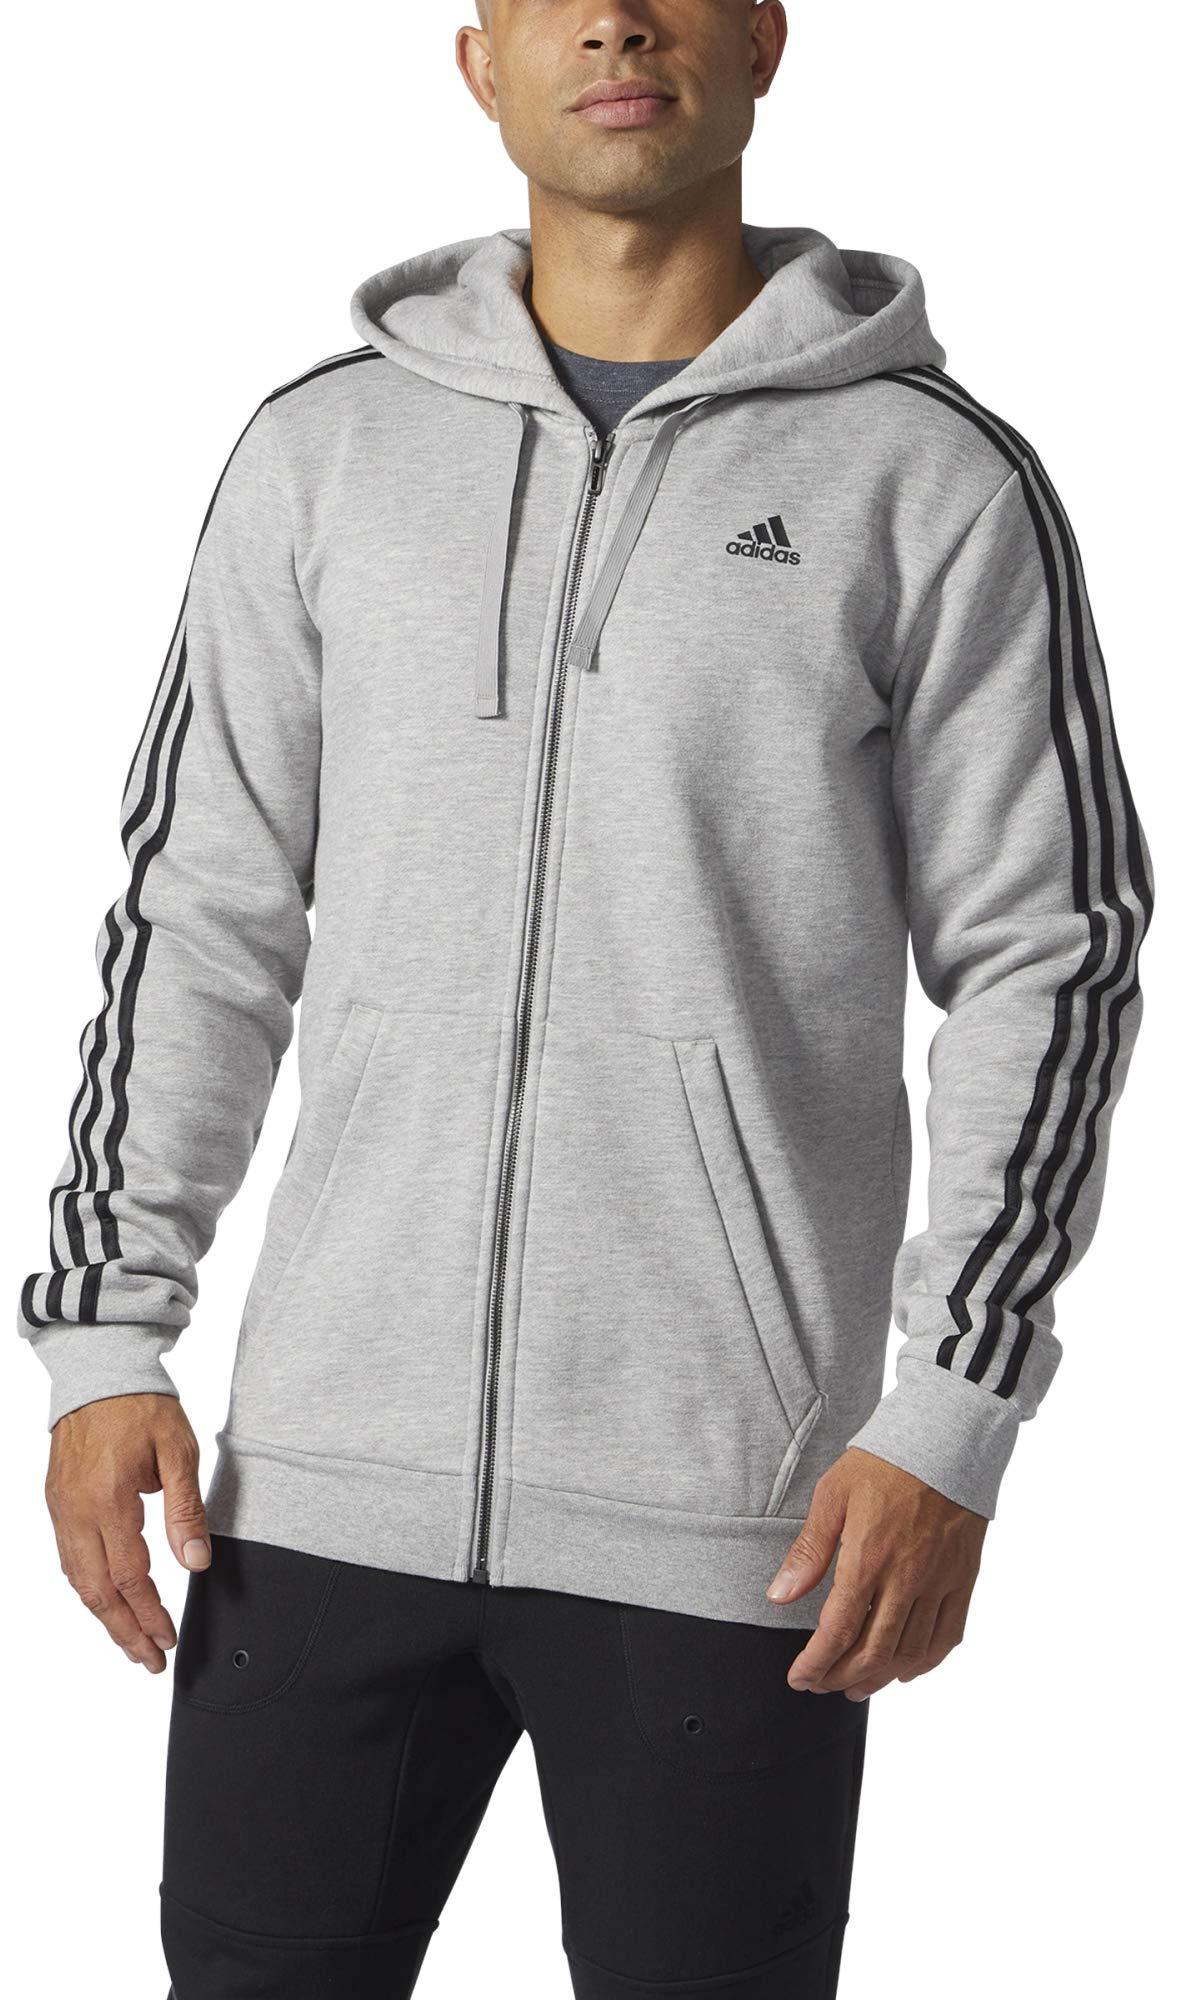 adidas Men's Athletics Essential Cotton 3 Stripe Full Zip Hoody, Medium Grey Heather/Black, 3X-Large